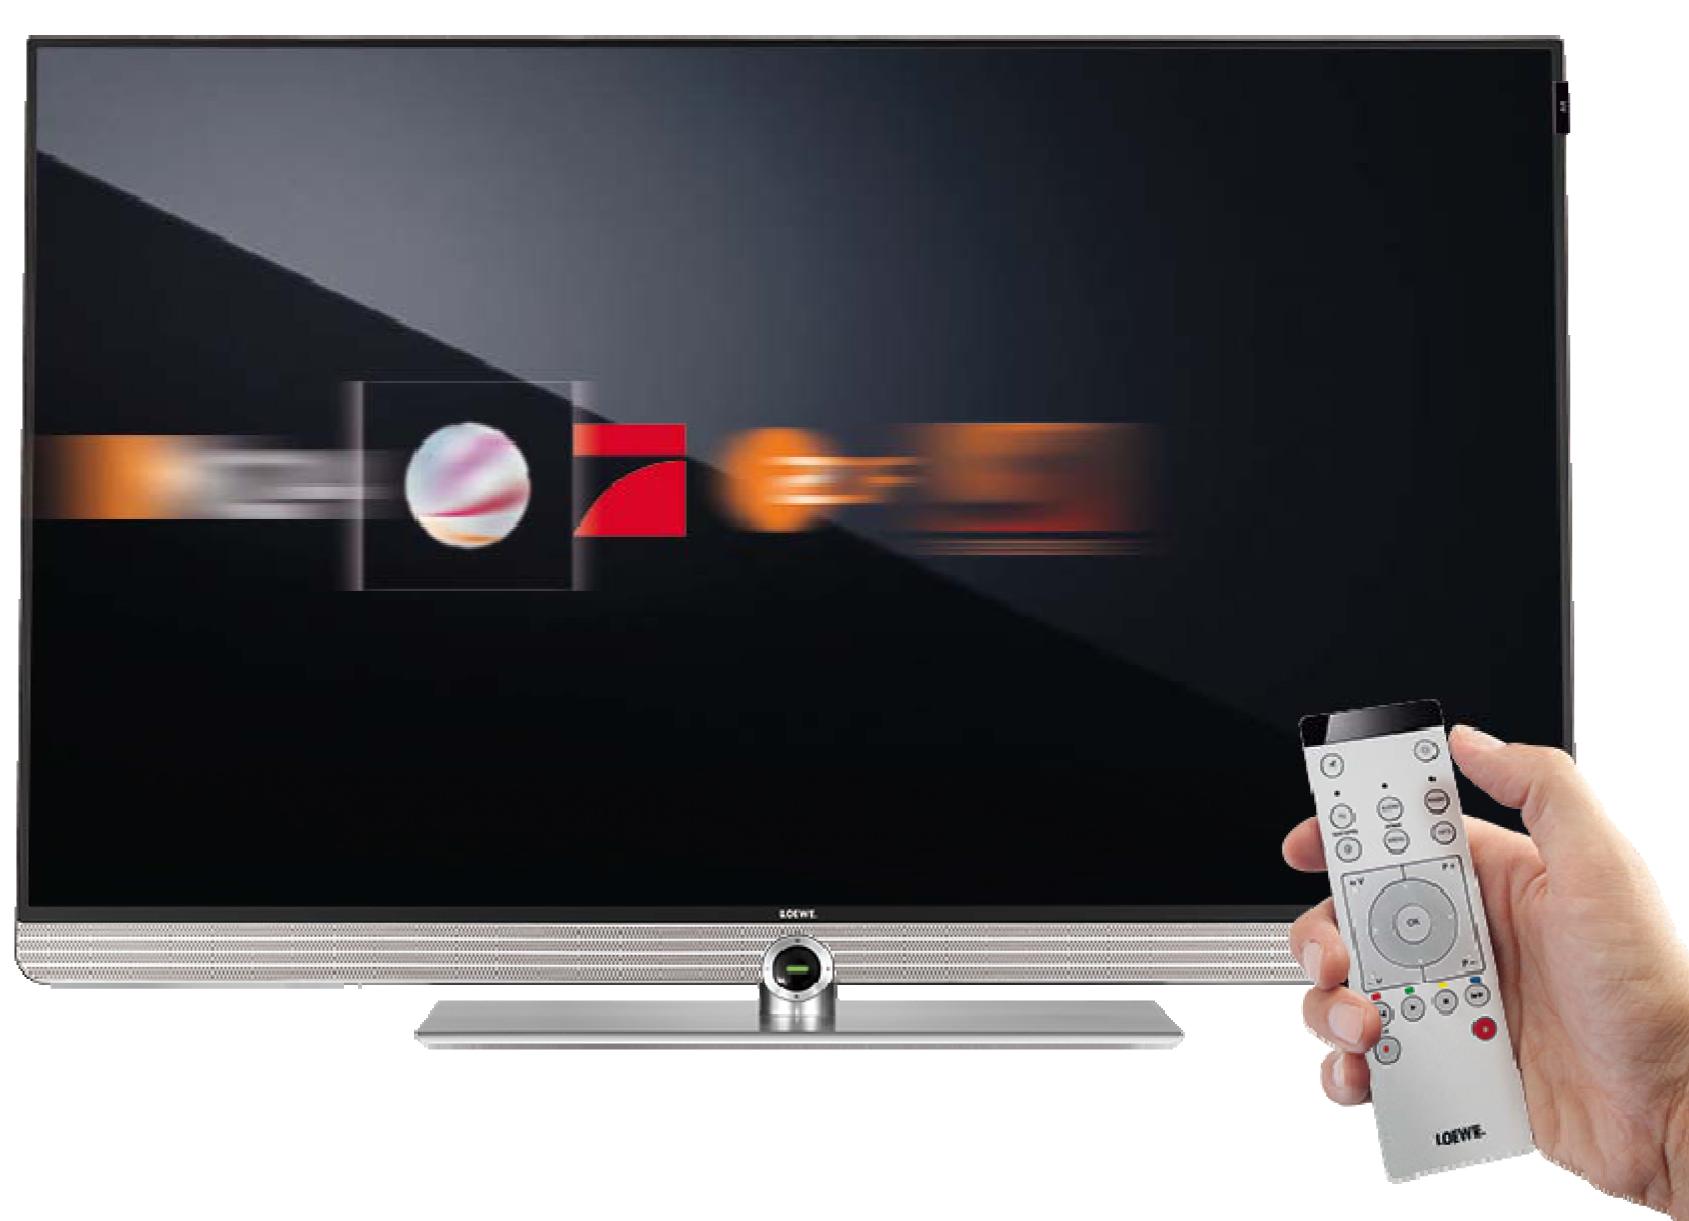 Loewe instant Channel Changement rapide des chaînes. Loewe Art 48 UHD controlsound